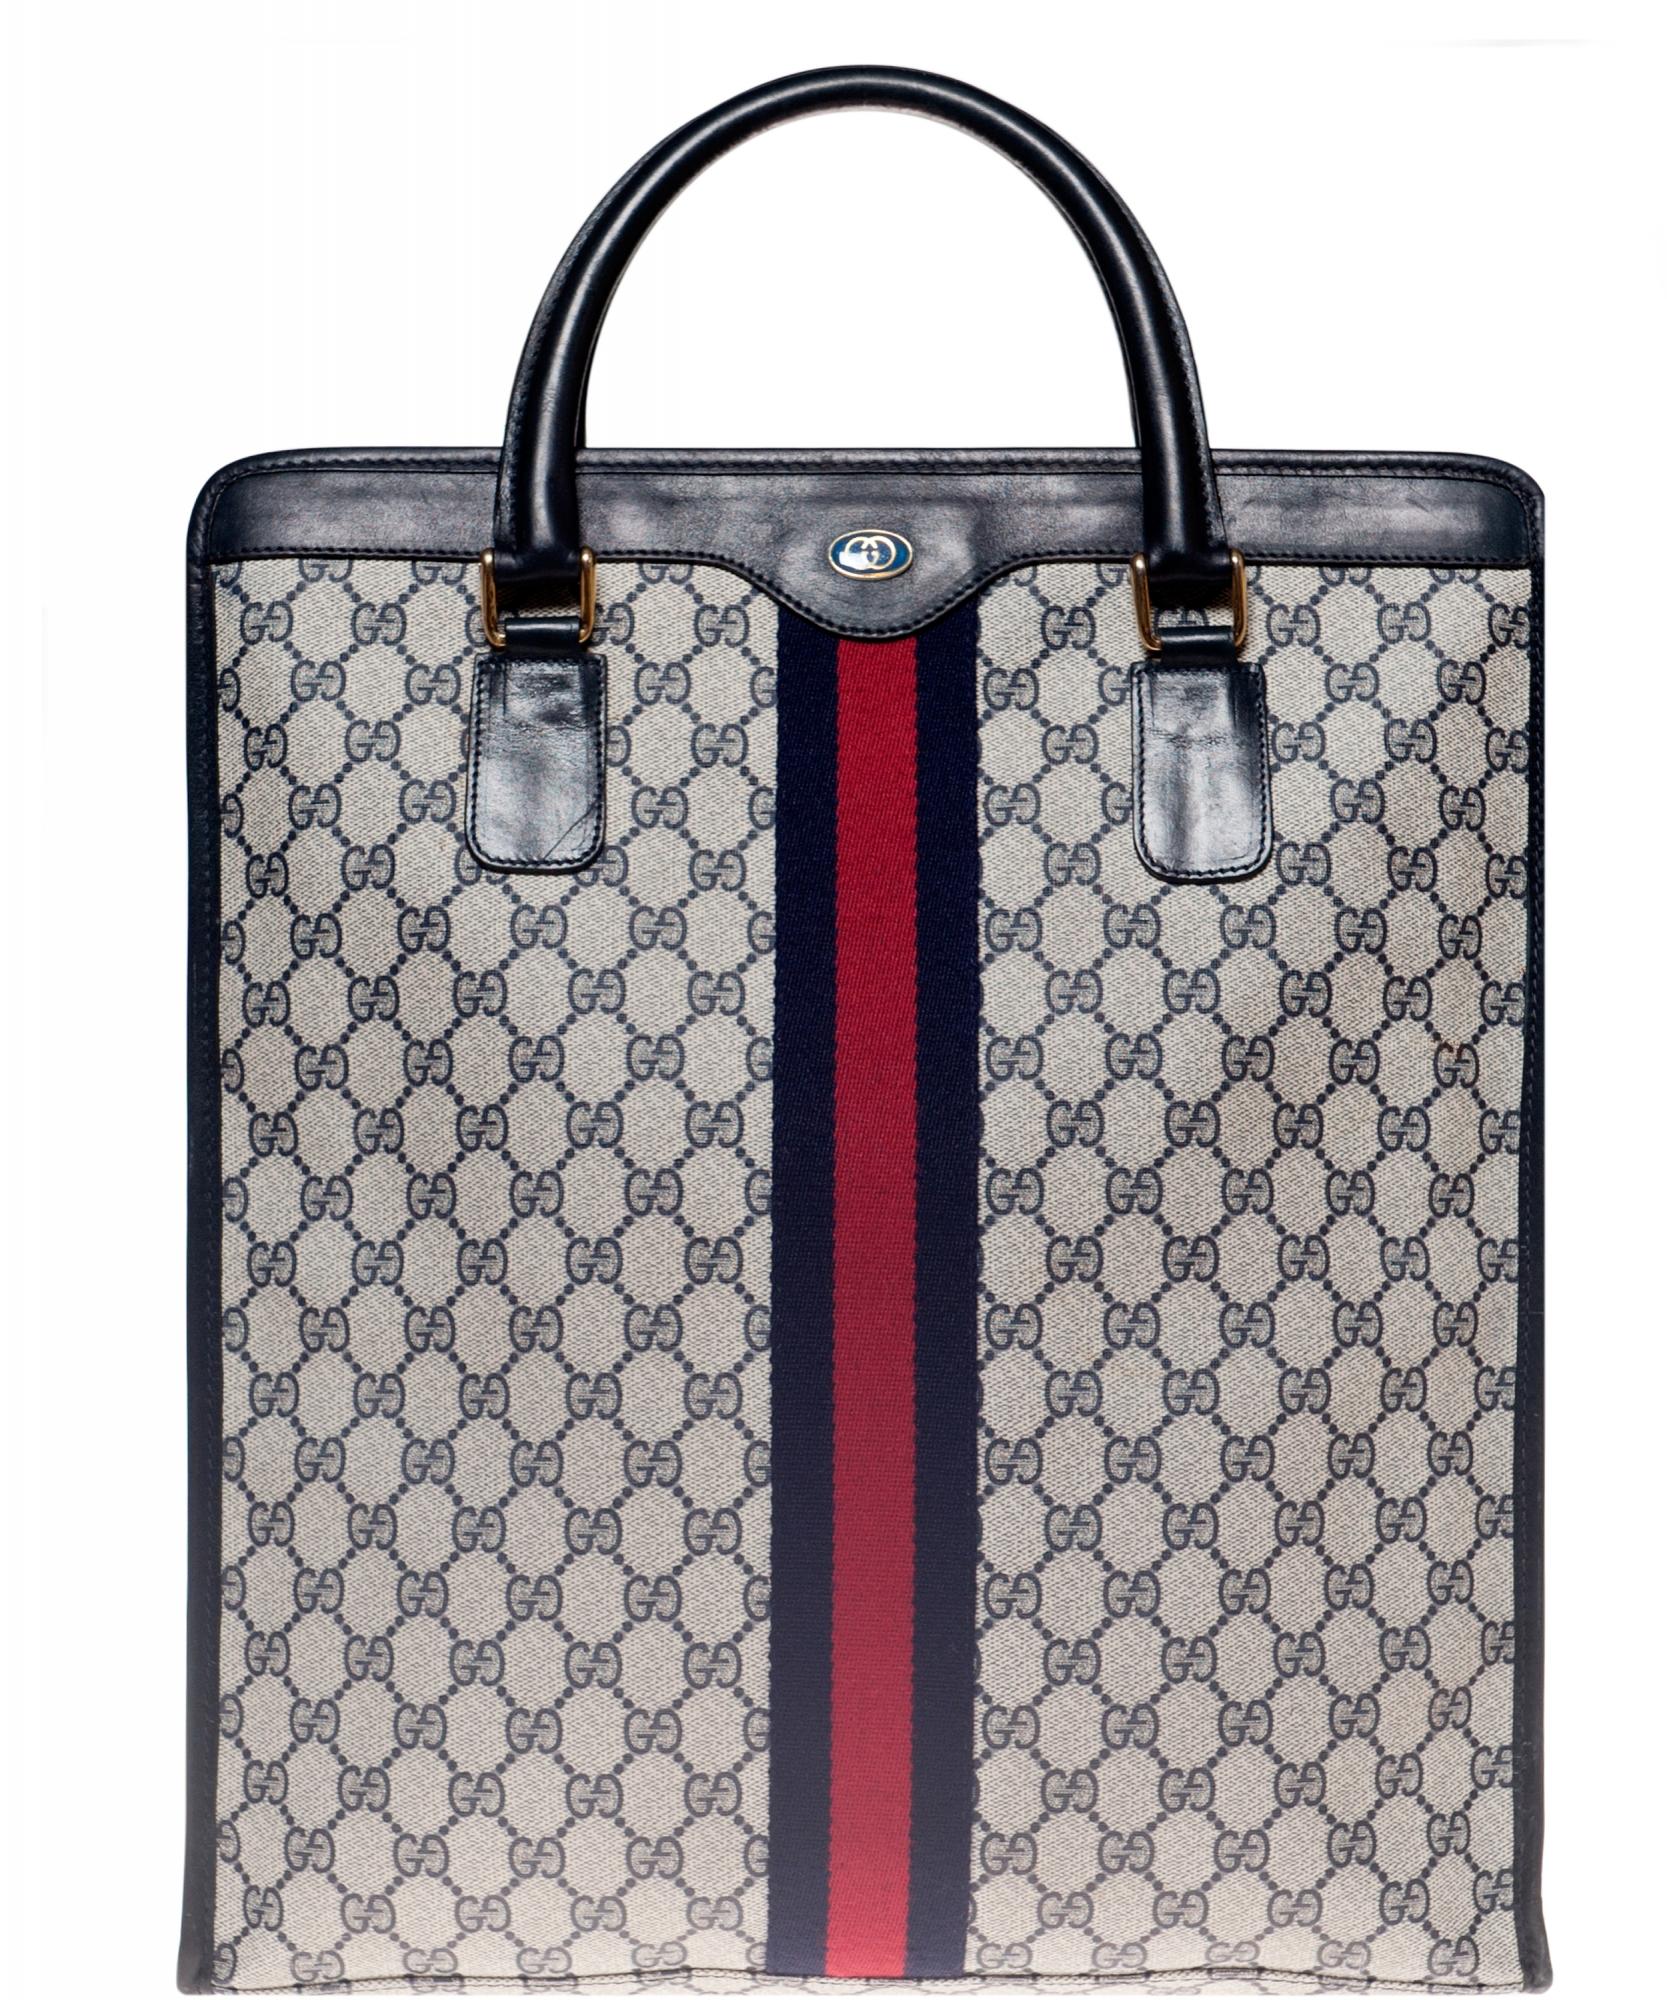 a6e2f67ecb22 Vintage Gucci Monogram Tote Bag   La Doyenne